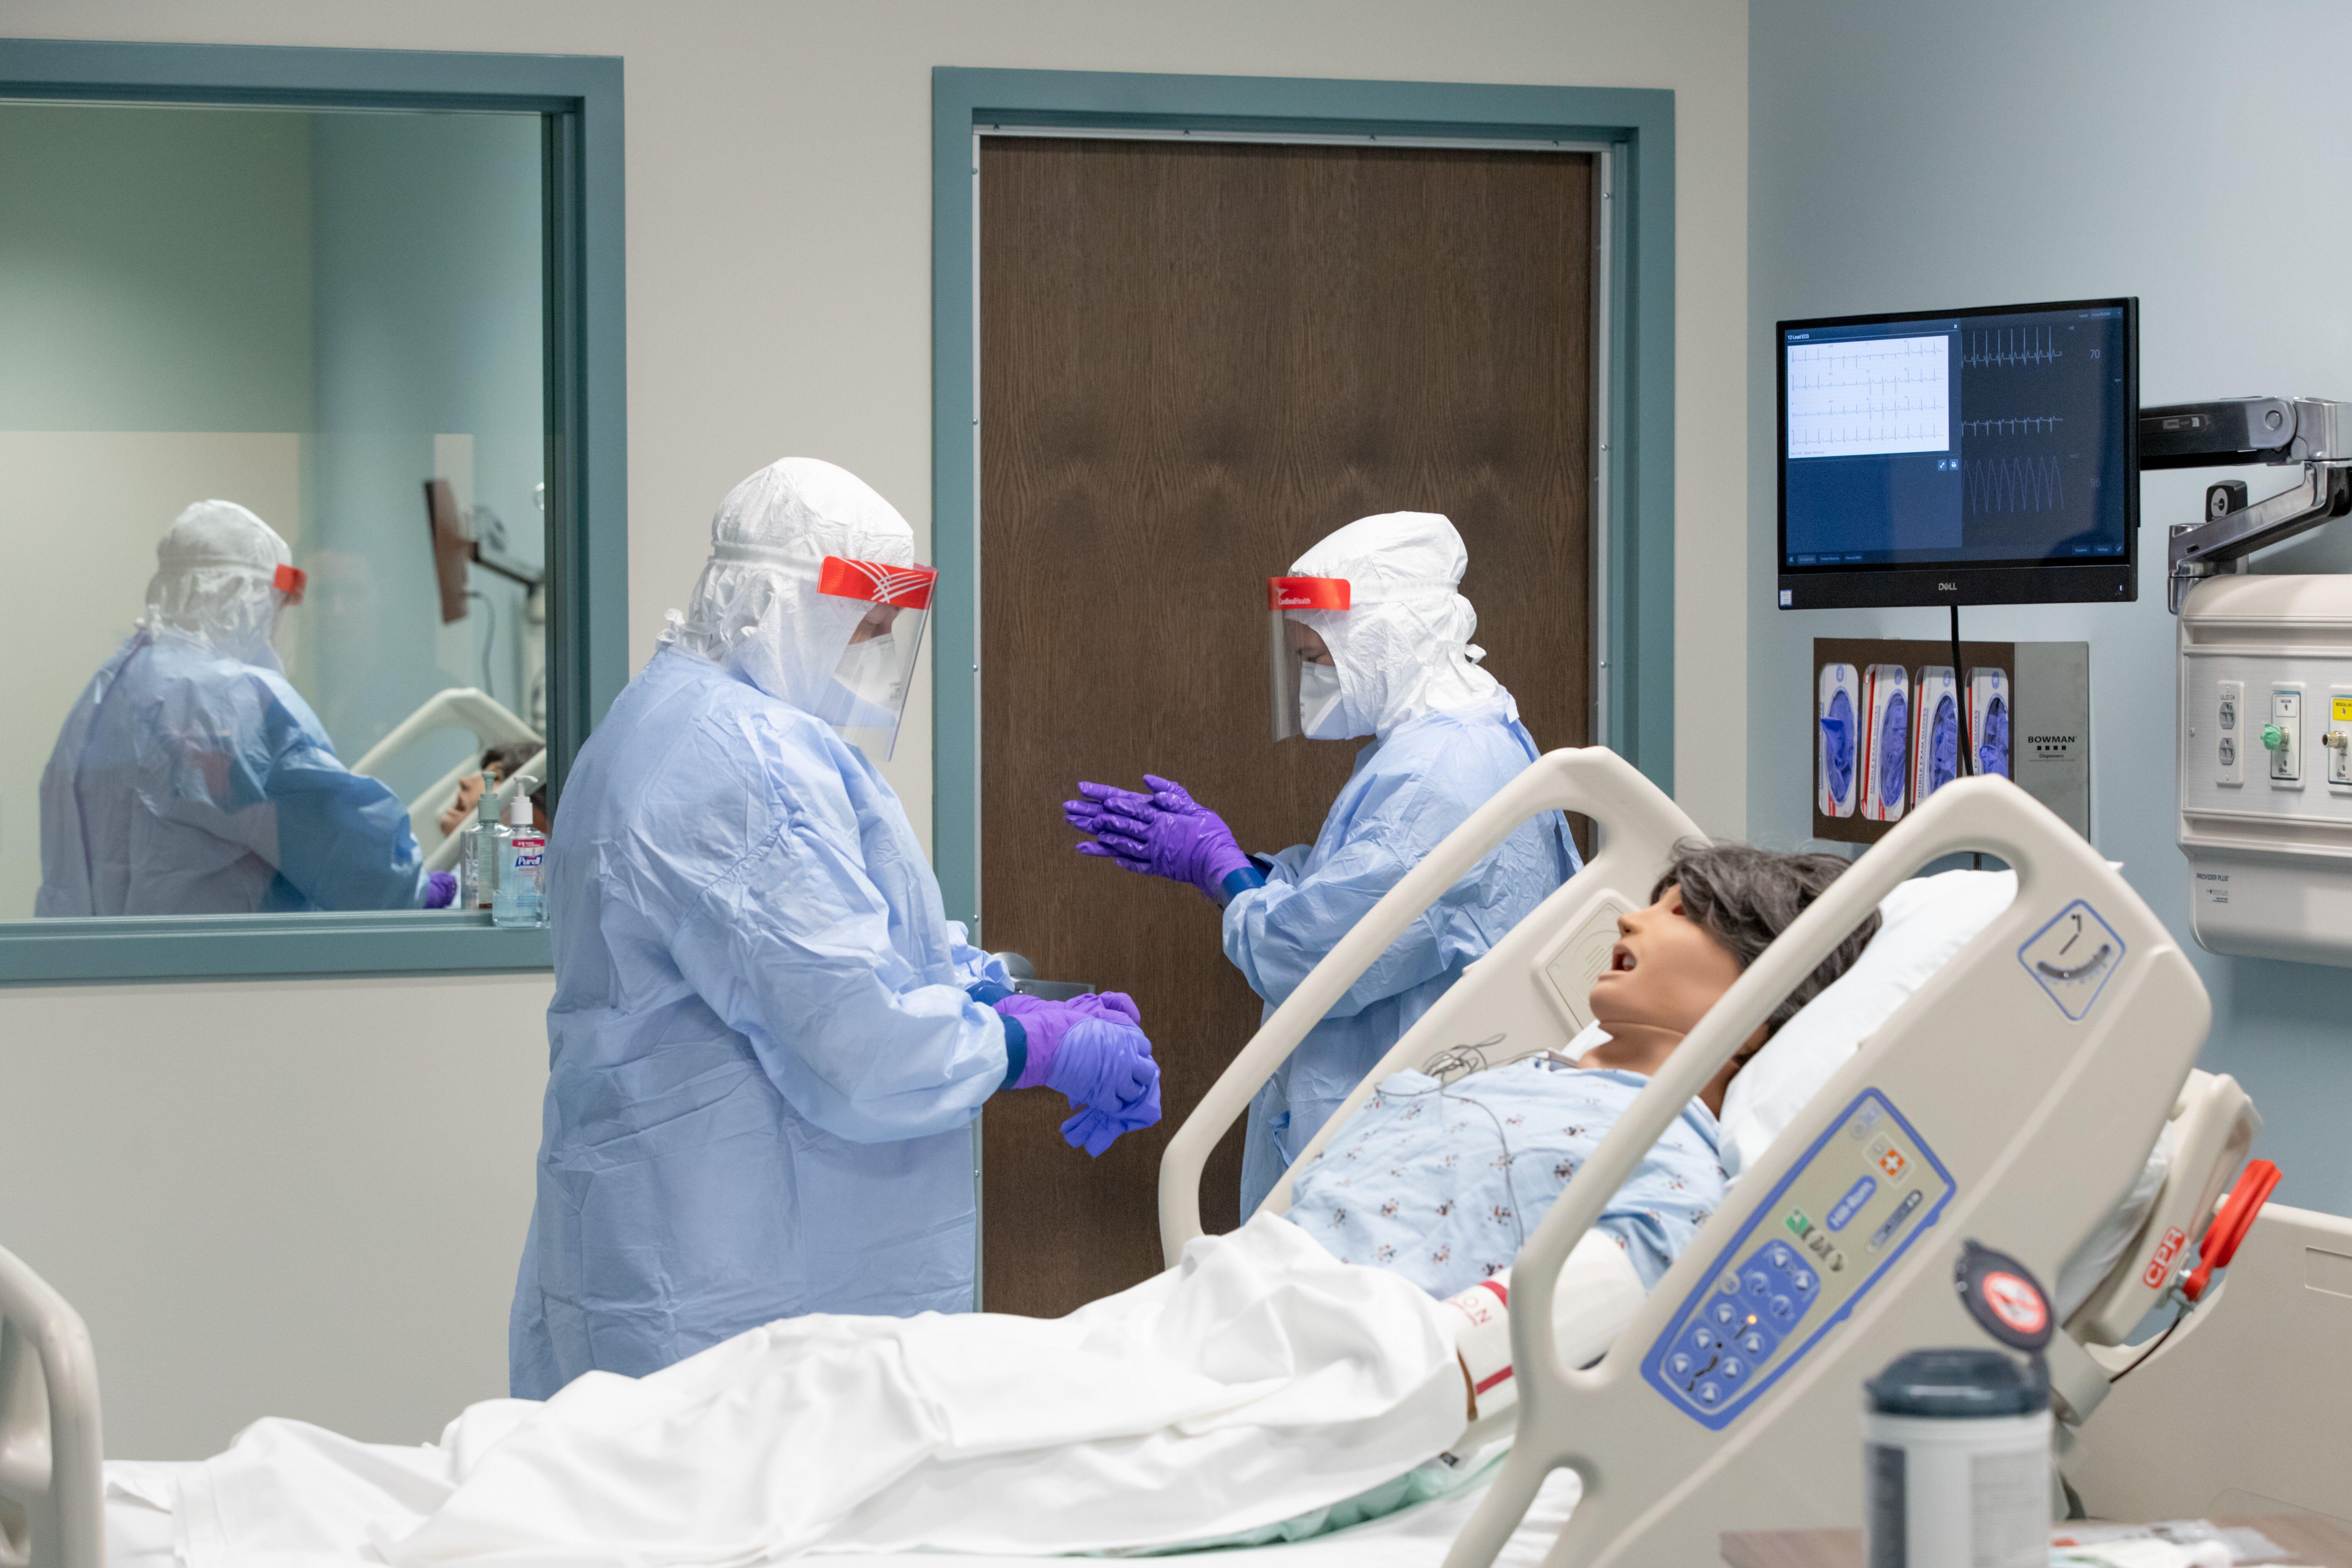 The National Quarantine Unitin Nebraska is seen during a training in 2019.